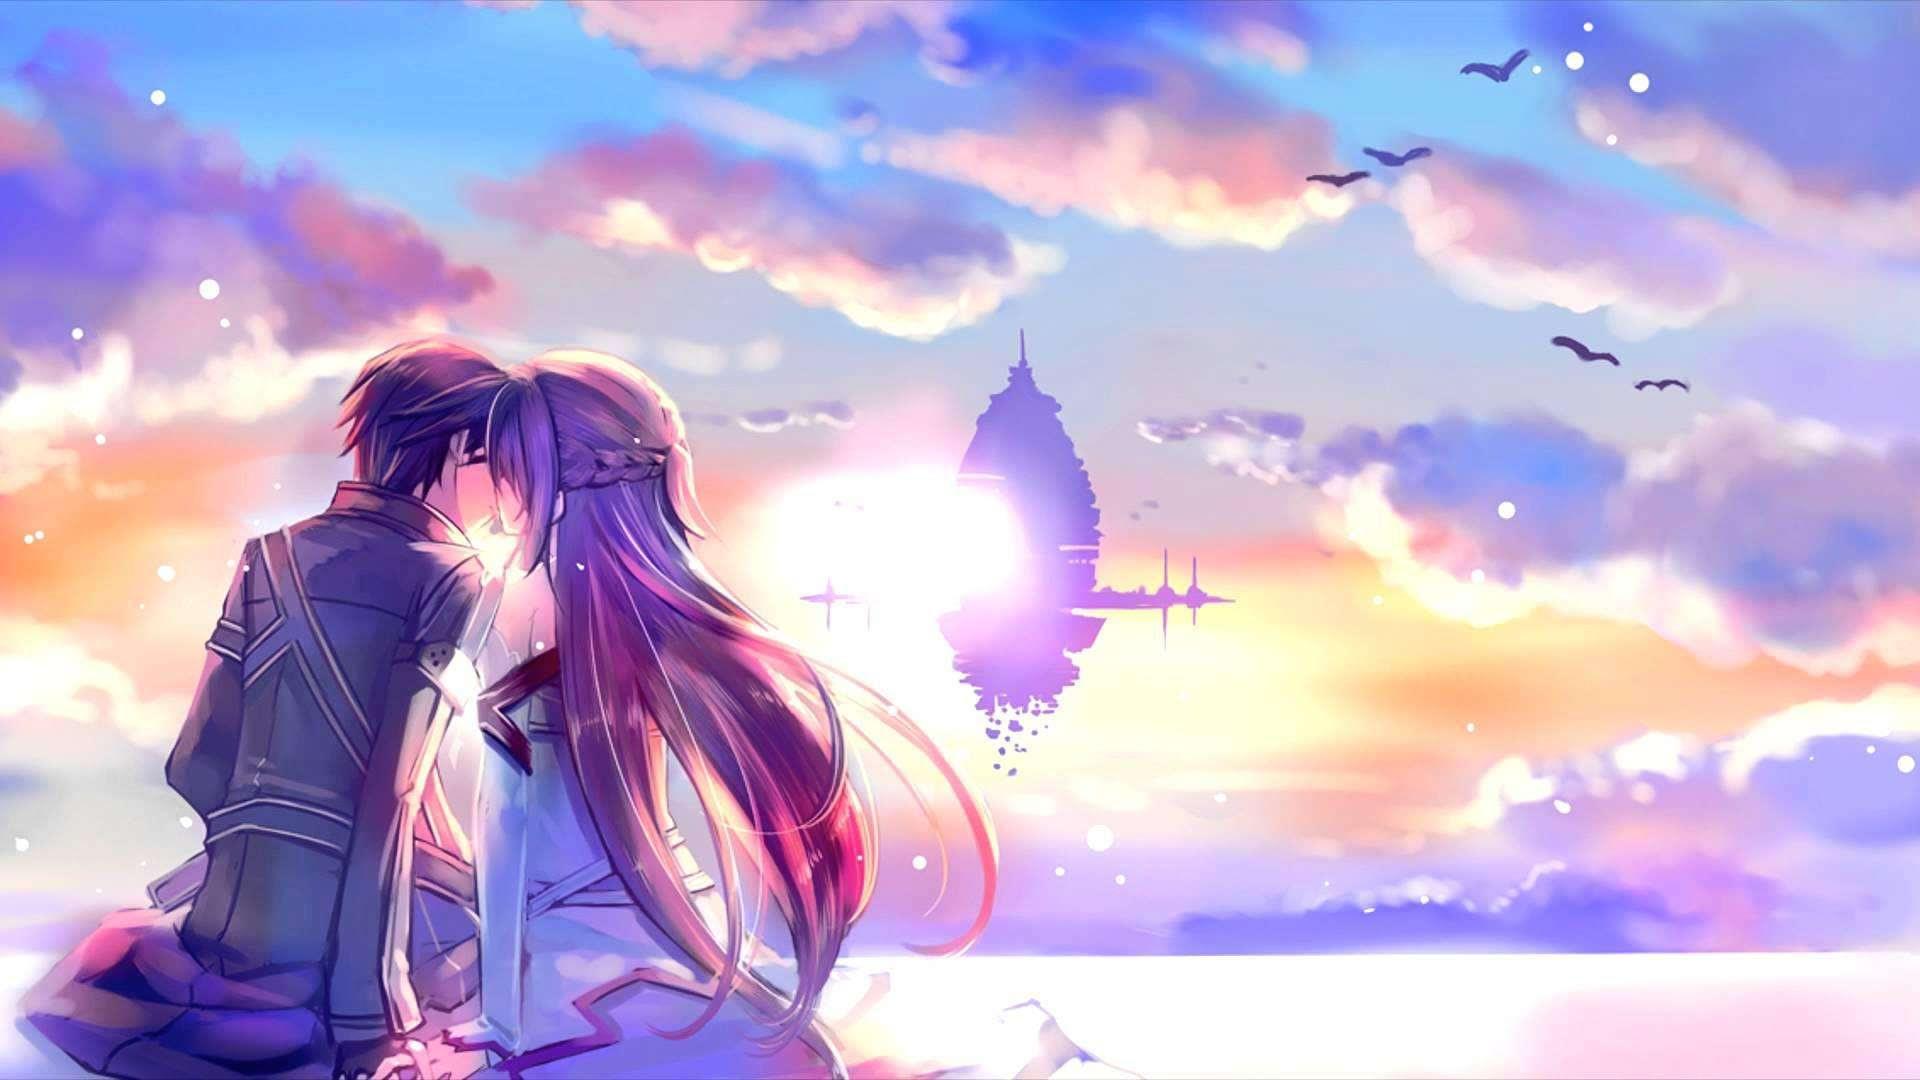 Download Free 1080p Anime Backgrounds  PixelsTalk.Net